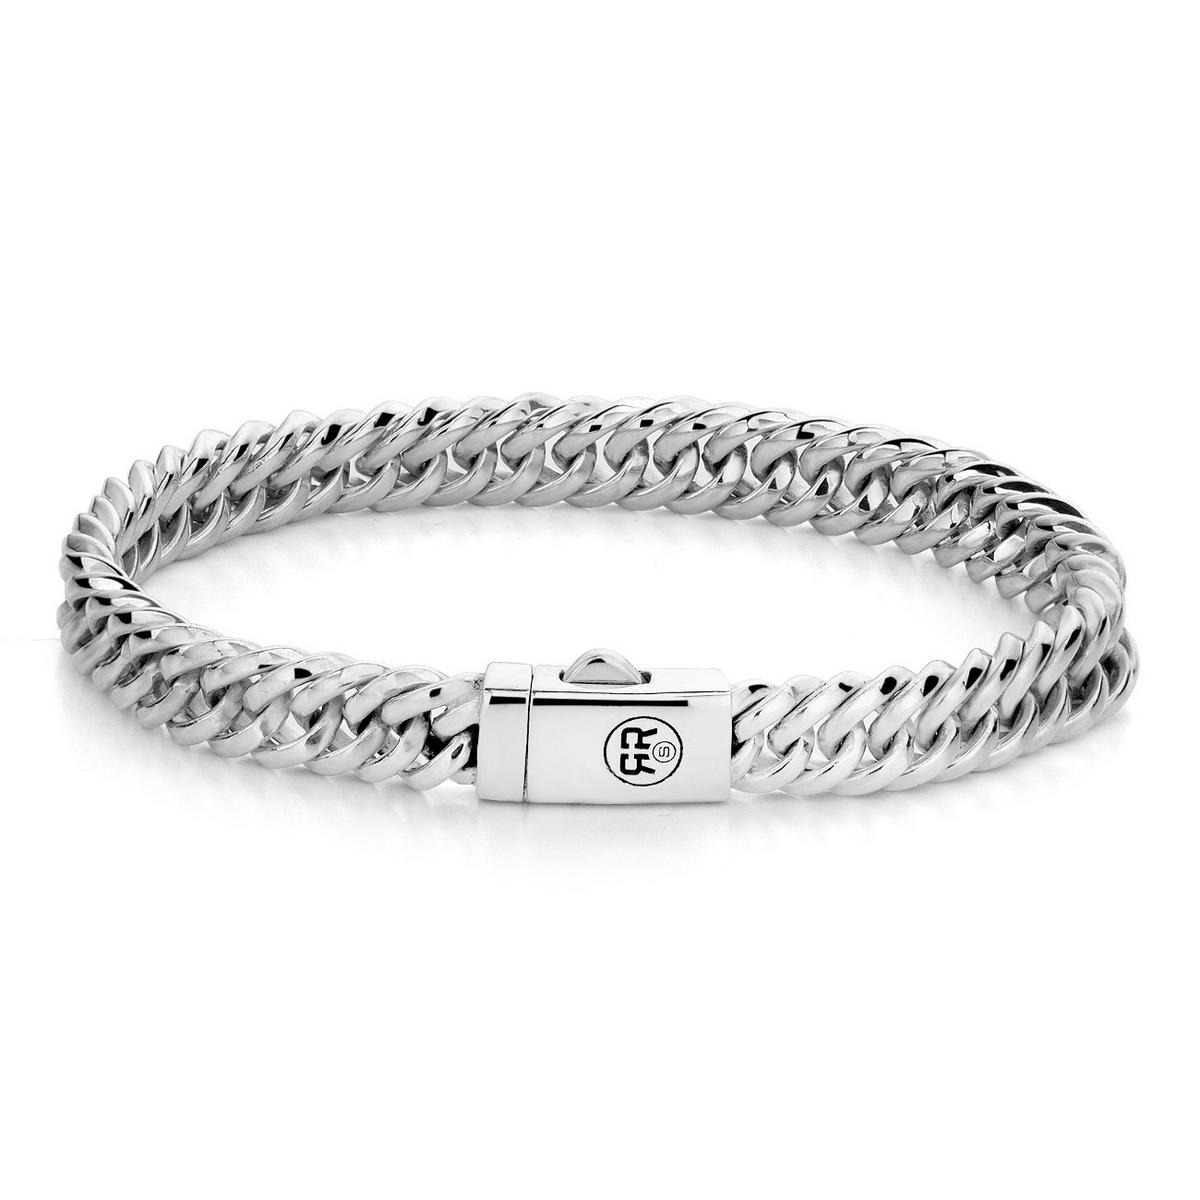 Rebel & Rose Hades Silver Bracelet S